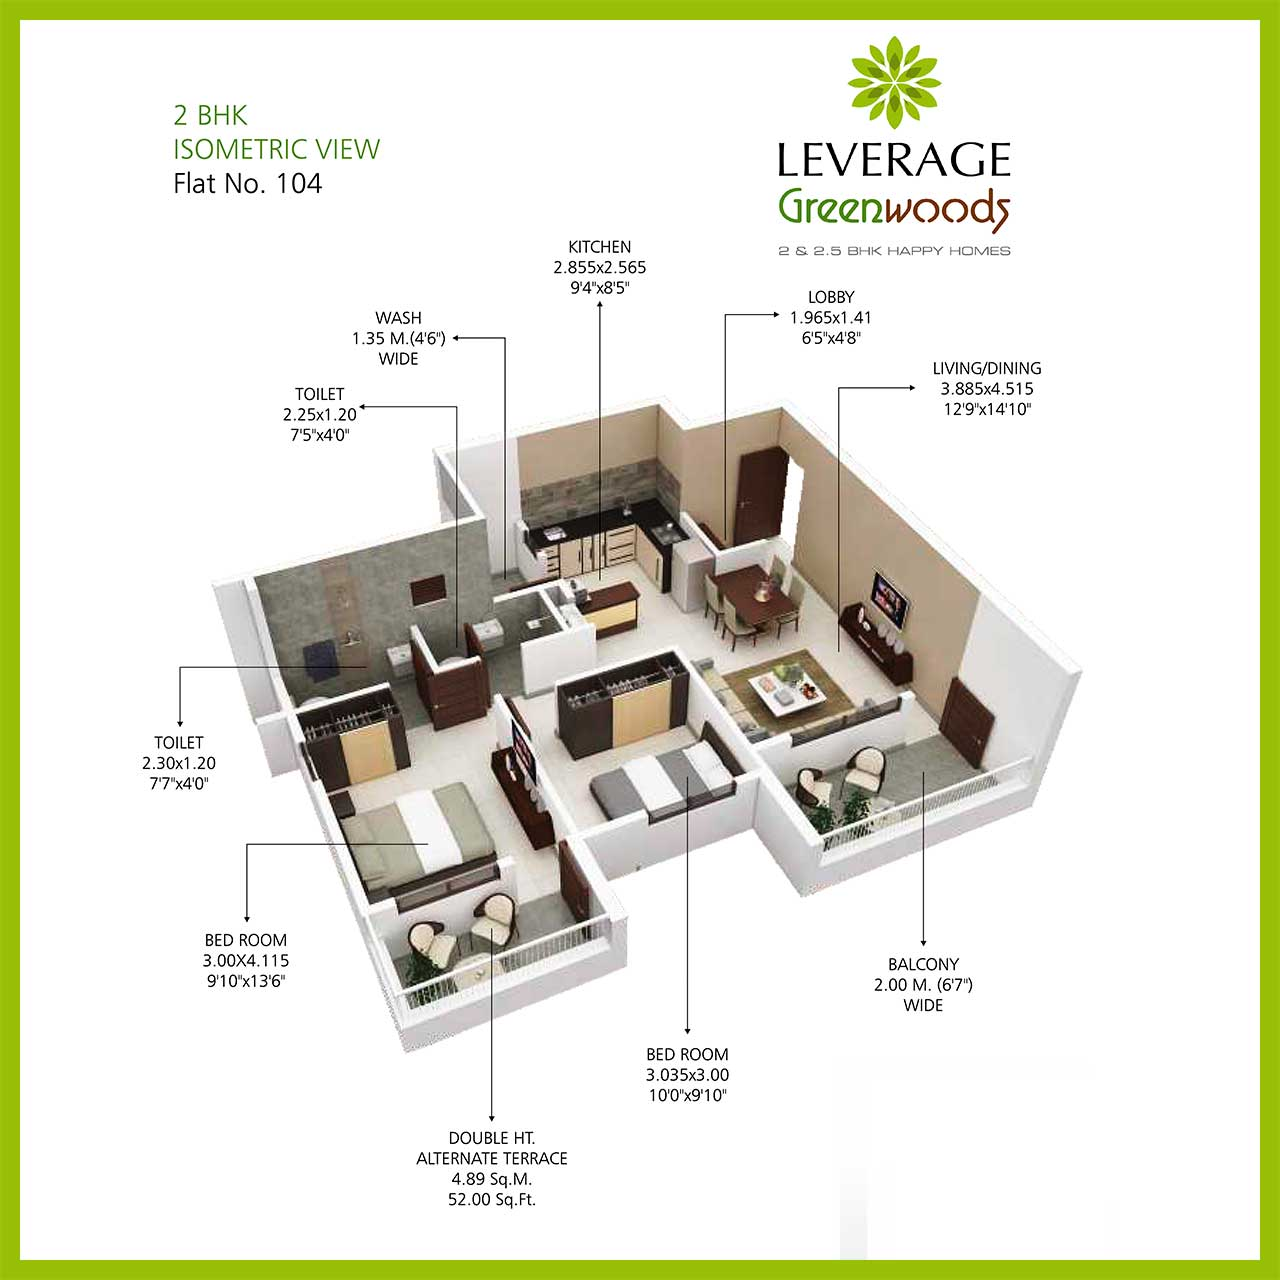 leverage-greenwood-harmony-2bhk-isometric